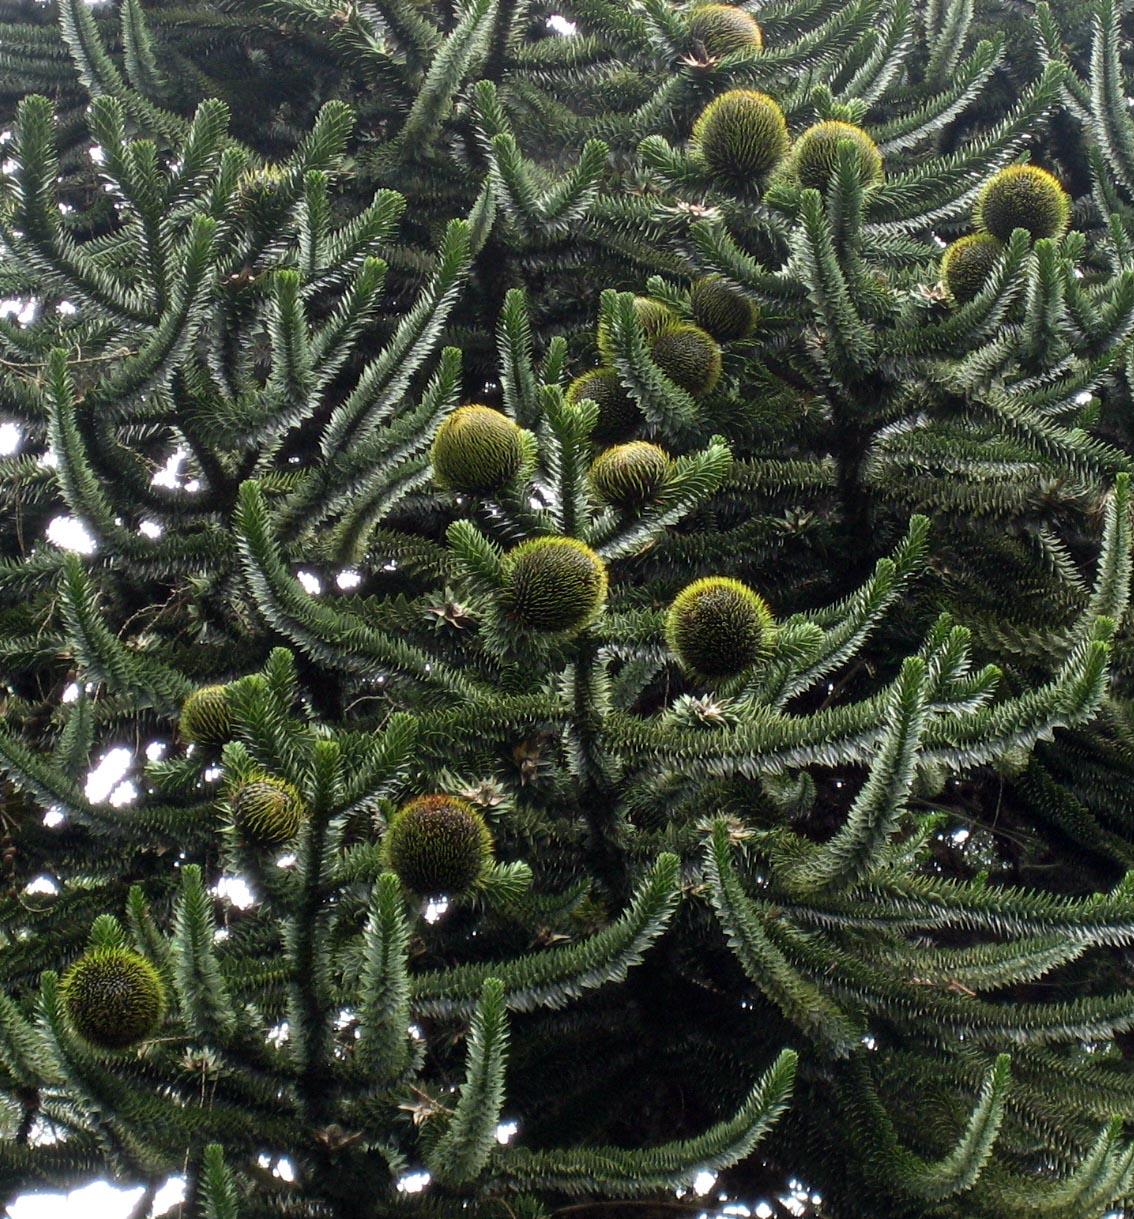 http://upload.wikimedia.org/wikipedia/commons/4/40/Araucaria_araucana_cones.jpg